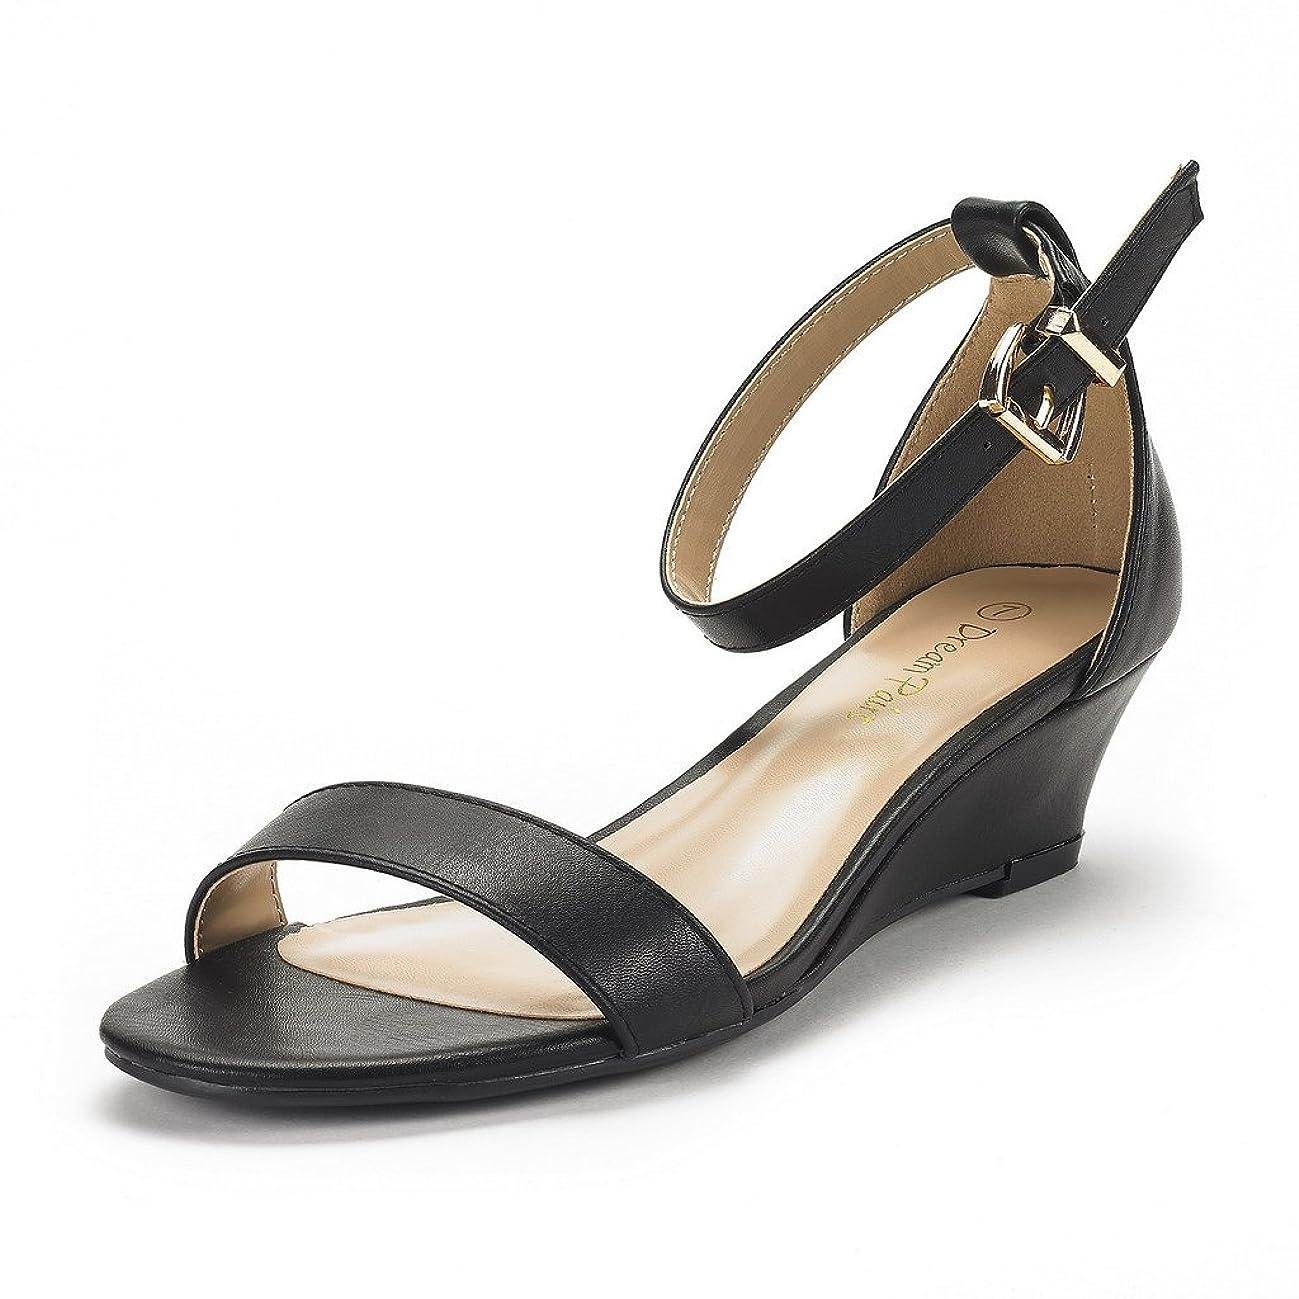 DREAM PAIRS Women's Ingrid Ankle Strap Low Wedge Sandal